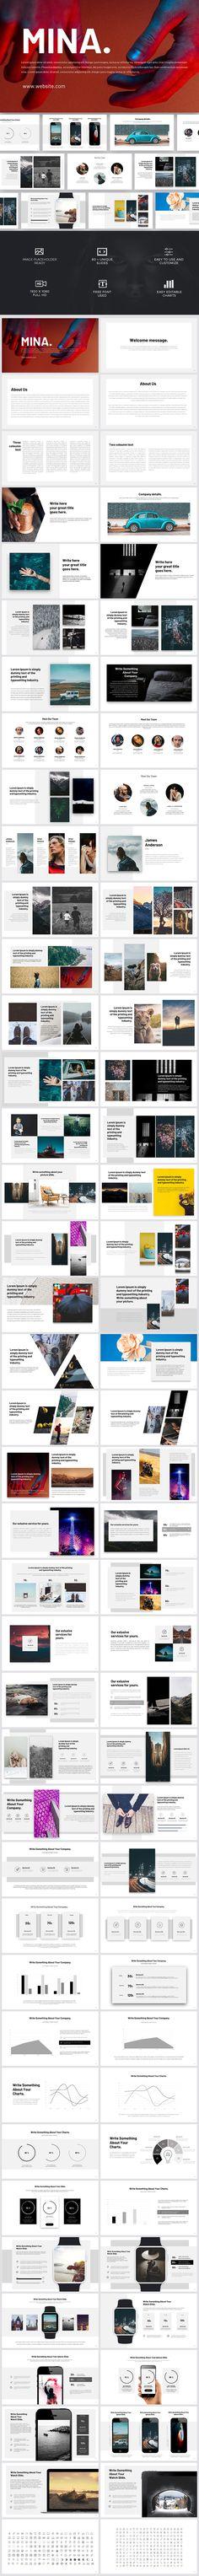 Mina Powerpoint Template - PowerPoint Templates Presentation Templates